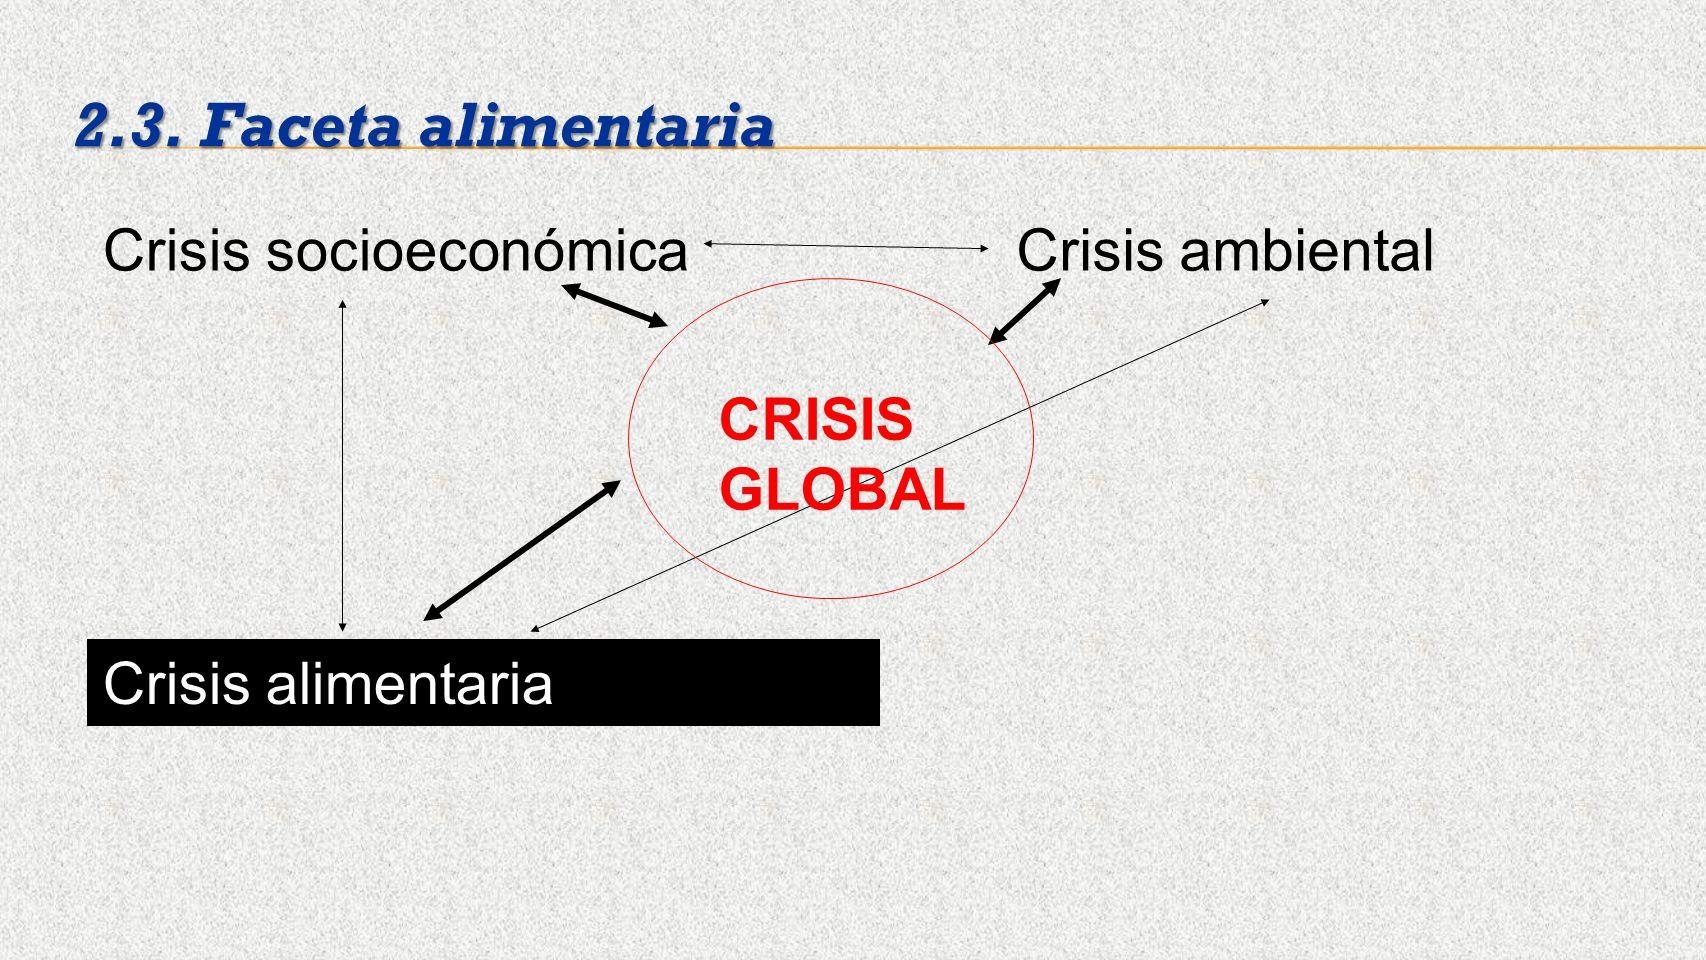 Crisis socioeconómicaCrisis ambiental Crisis alimentaria 2.3. Faceta alimentaria CRISIS GLOBAL